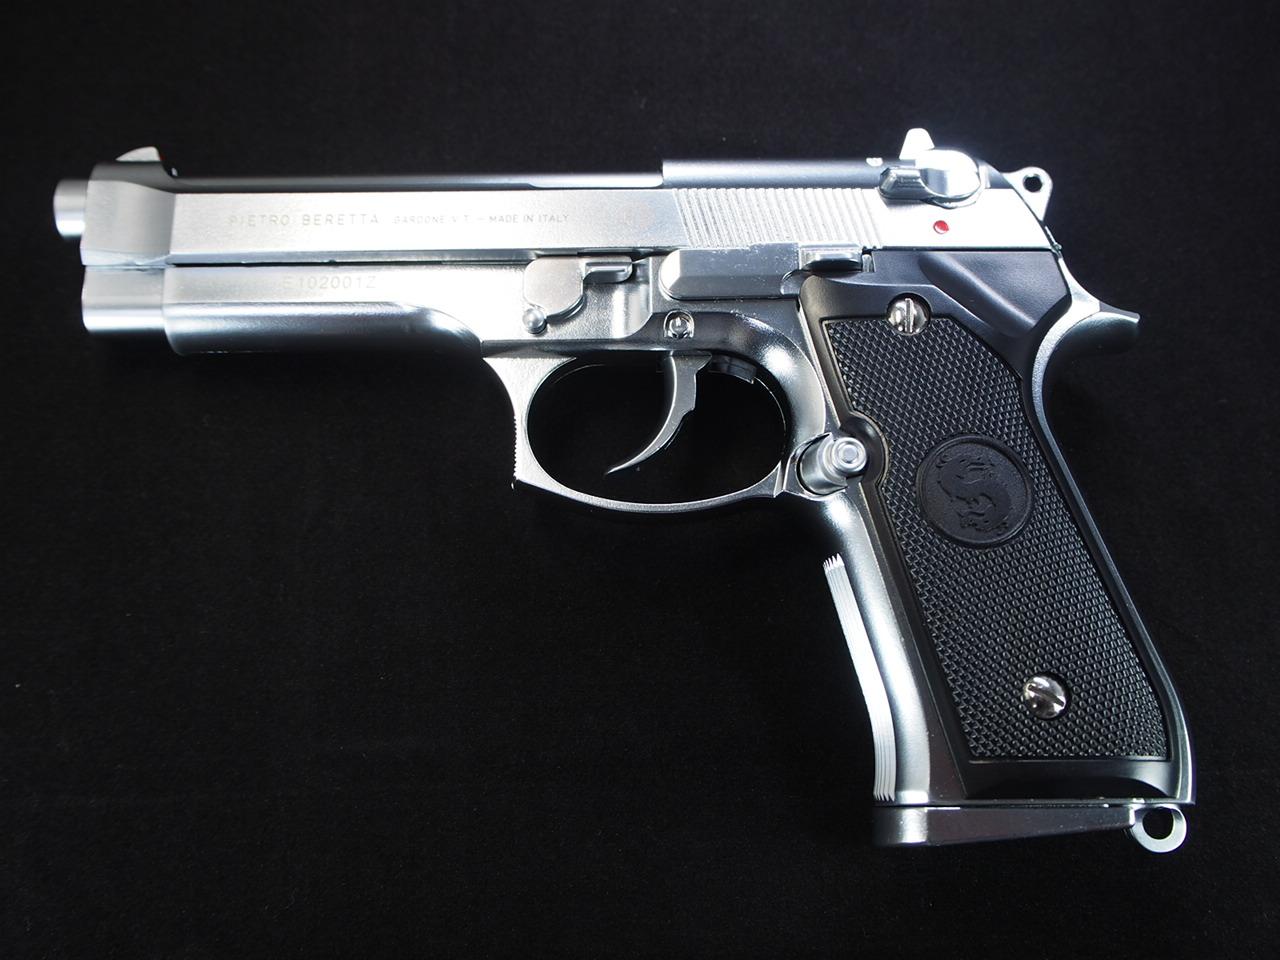 LS ベレッタ M92FS (SV)